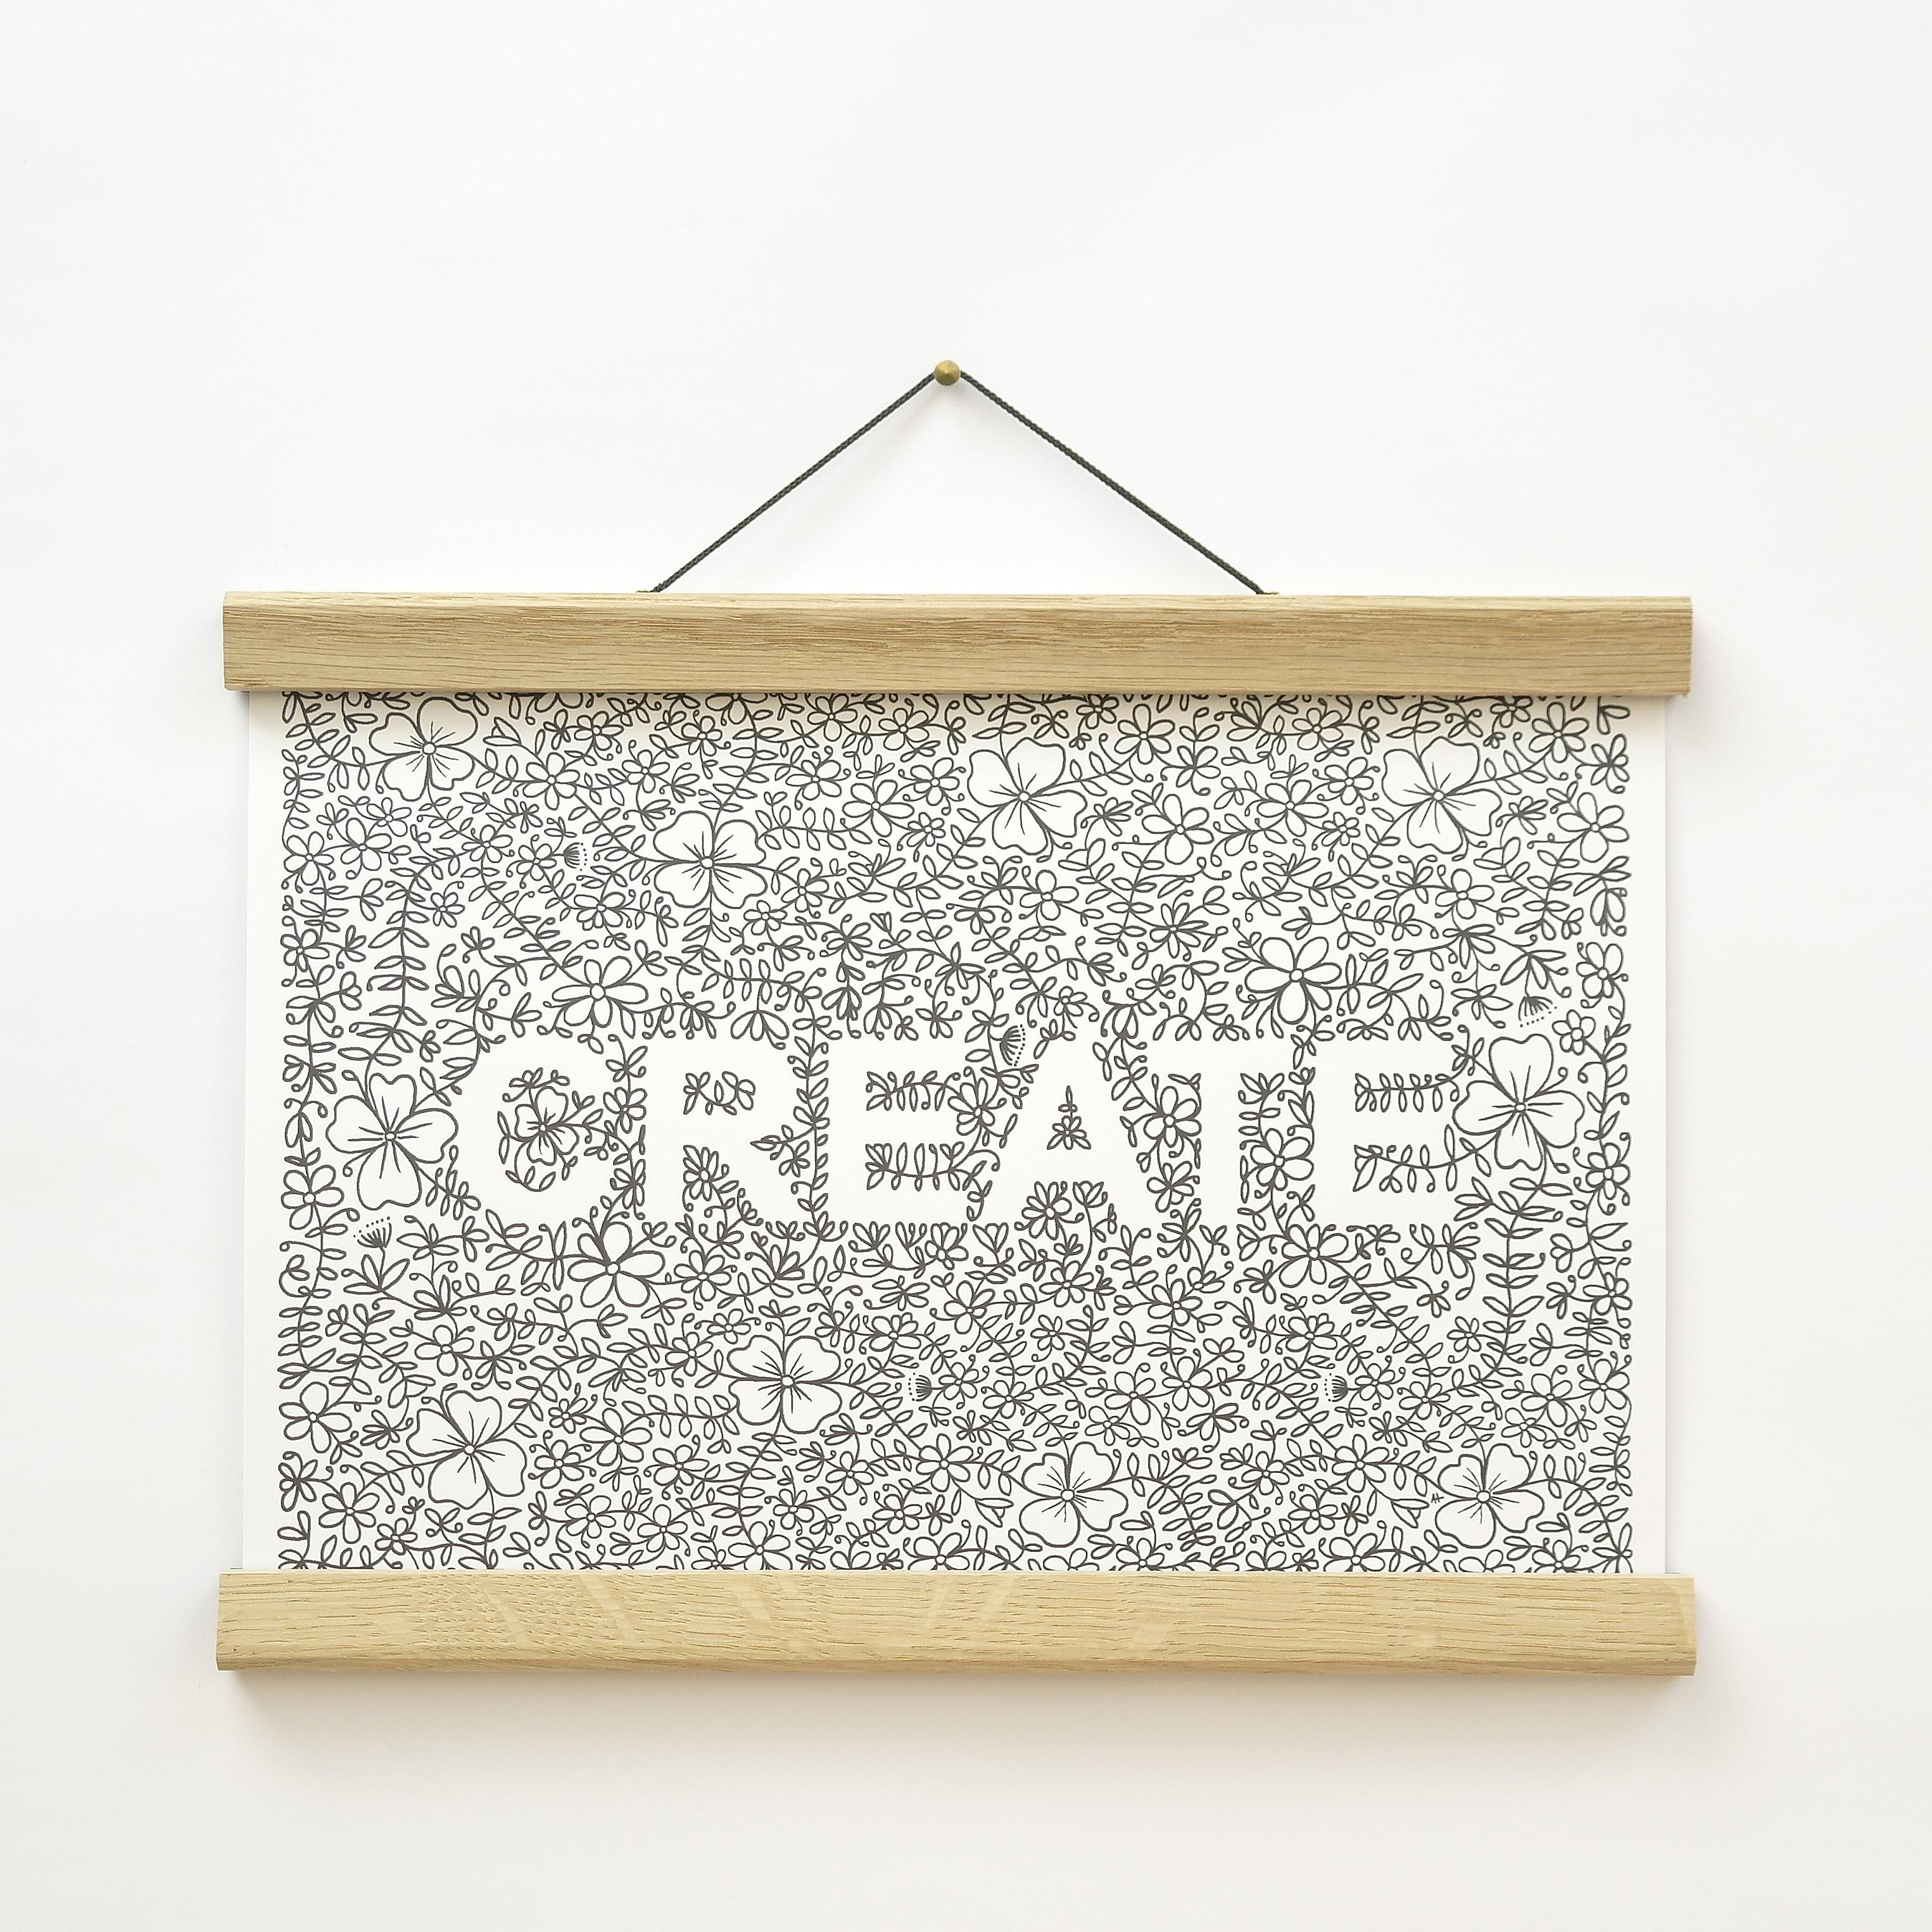 'Create' A4 Floral Print (unframed)